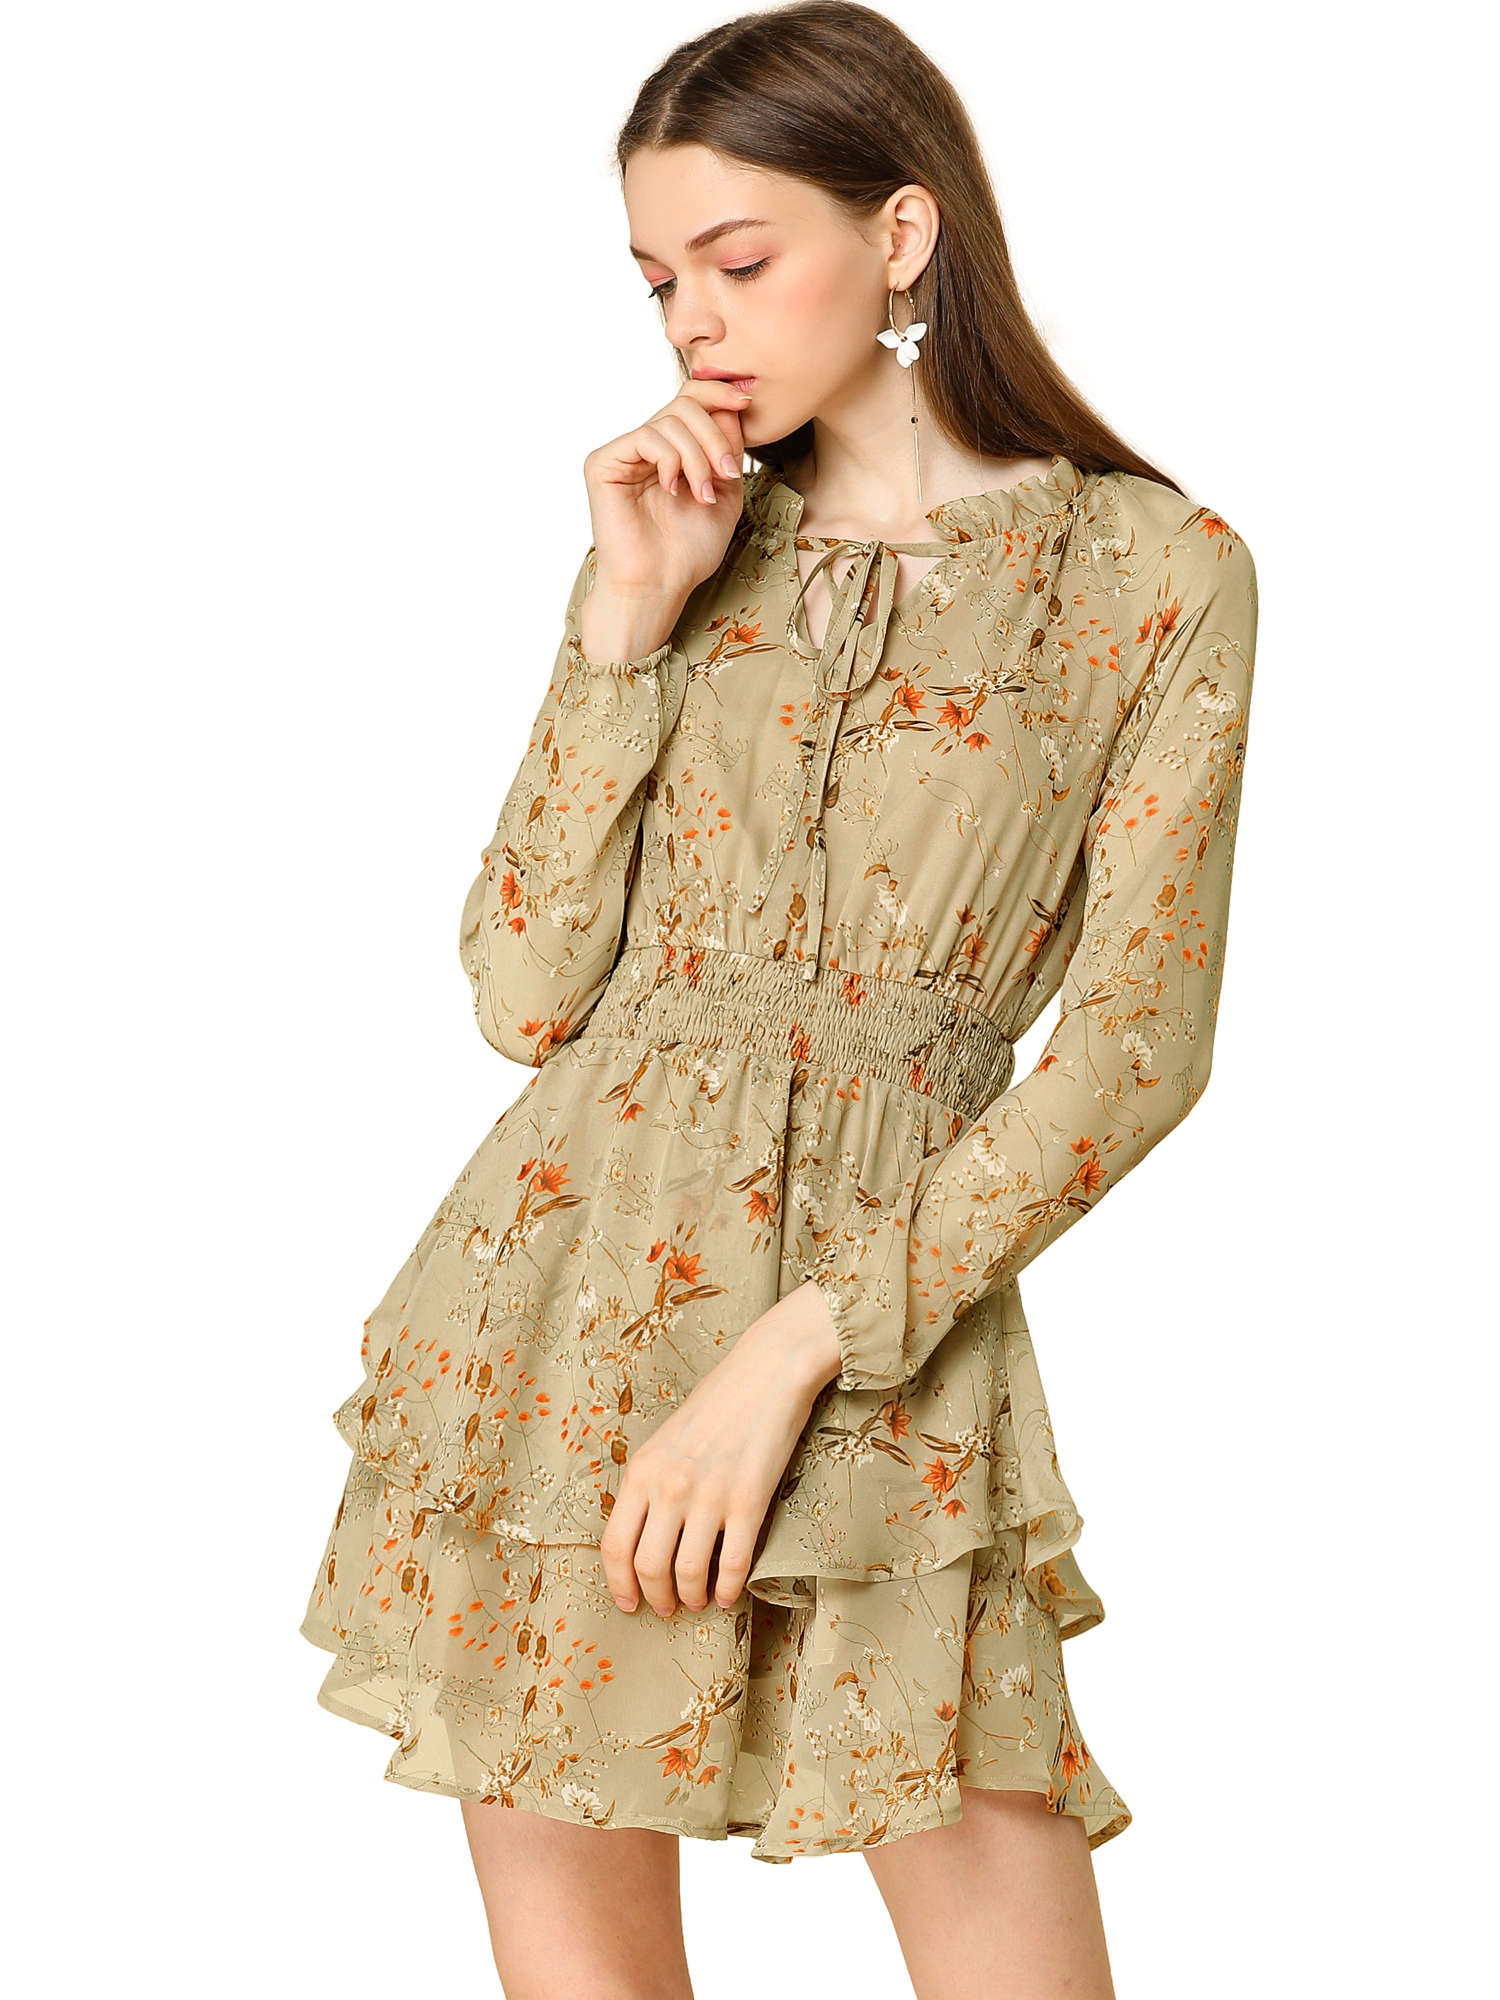 Allegra K Women's Floral Smocked Waist Chiffon Dress Khaki XS